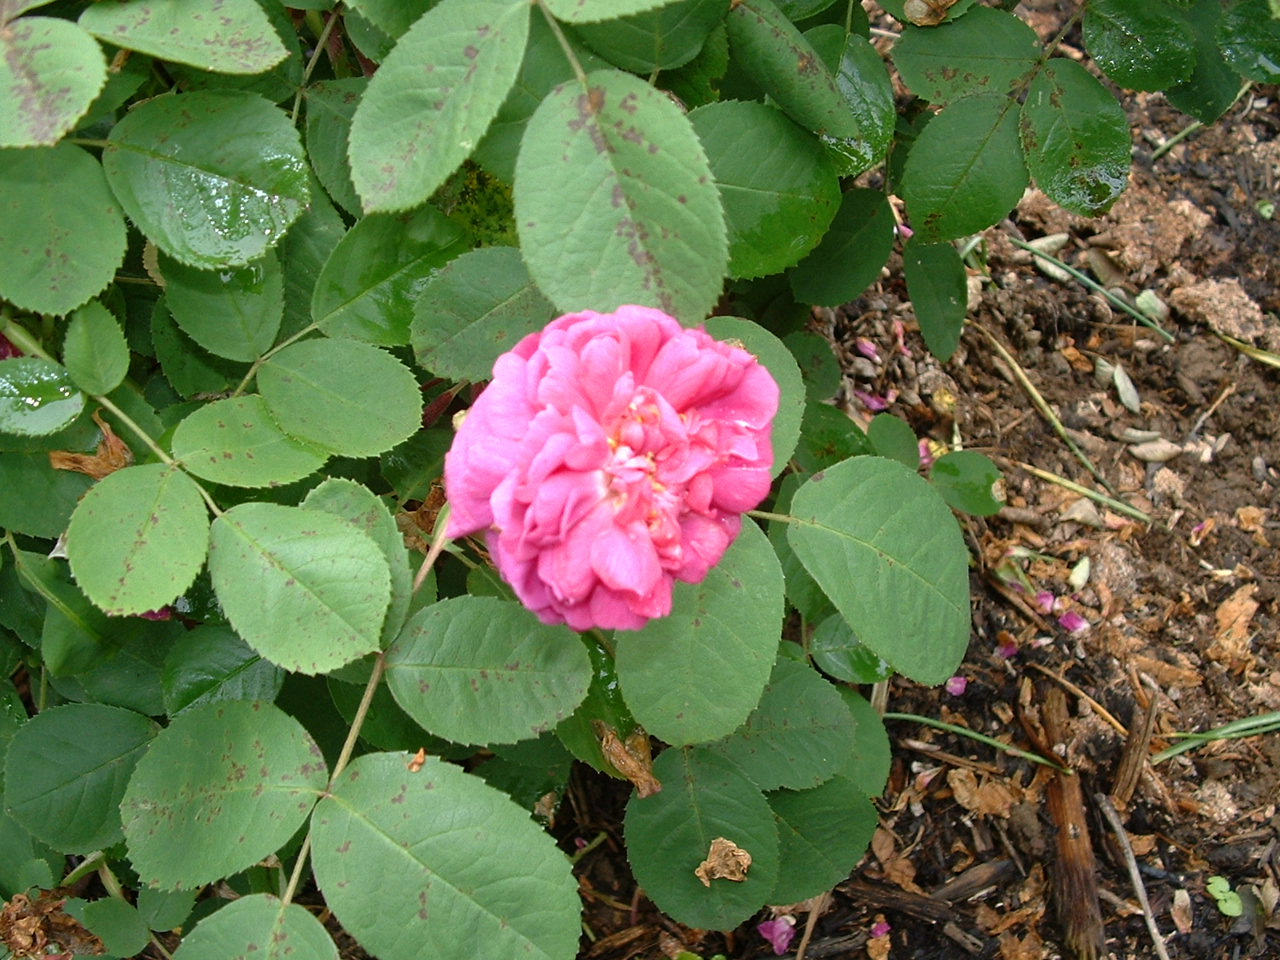 Rosa Mundi - Rosemary Hodgson - Rosa Mundi